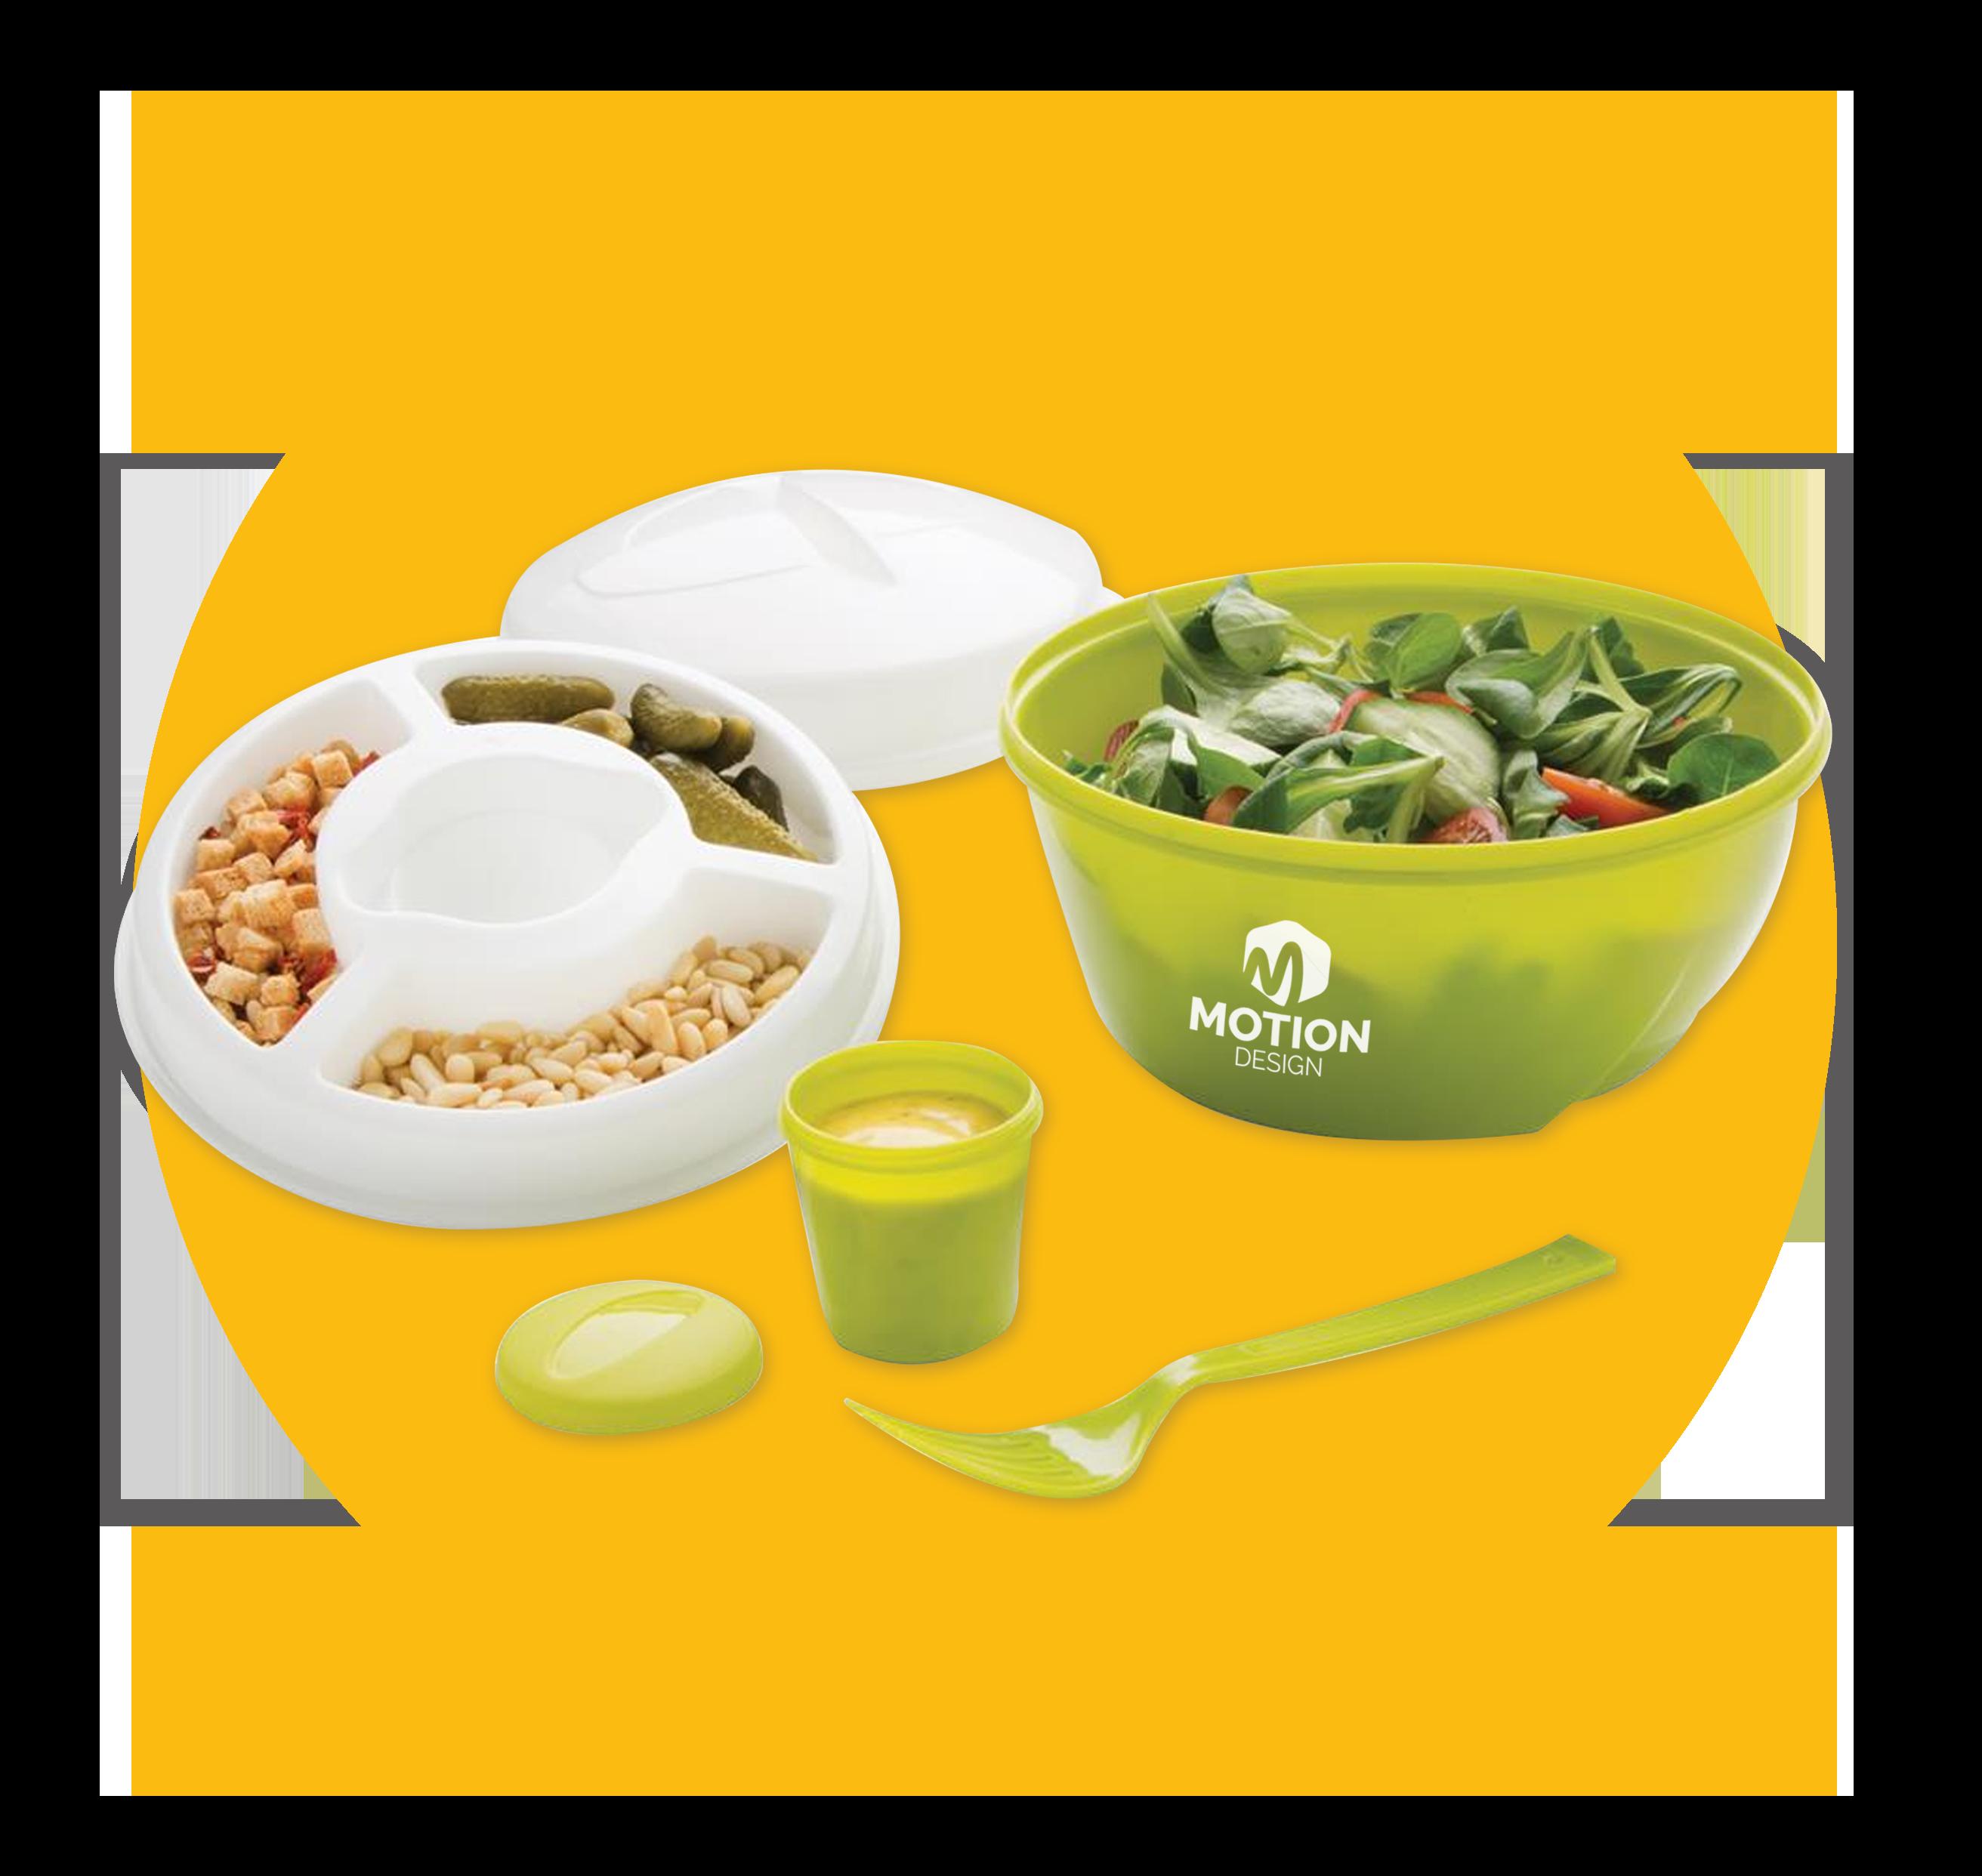 Promotional salad bowl